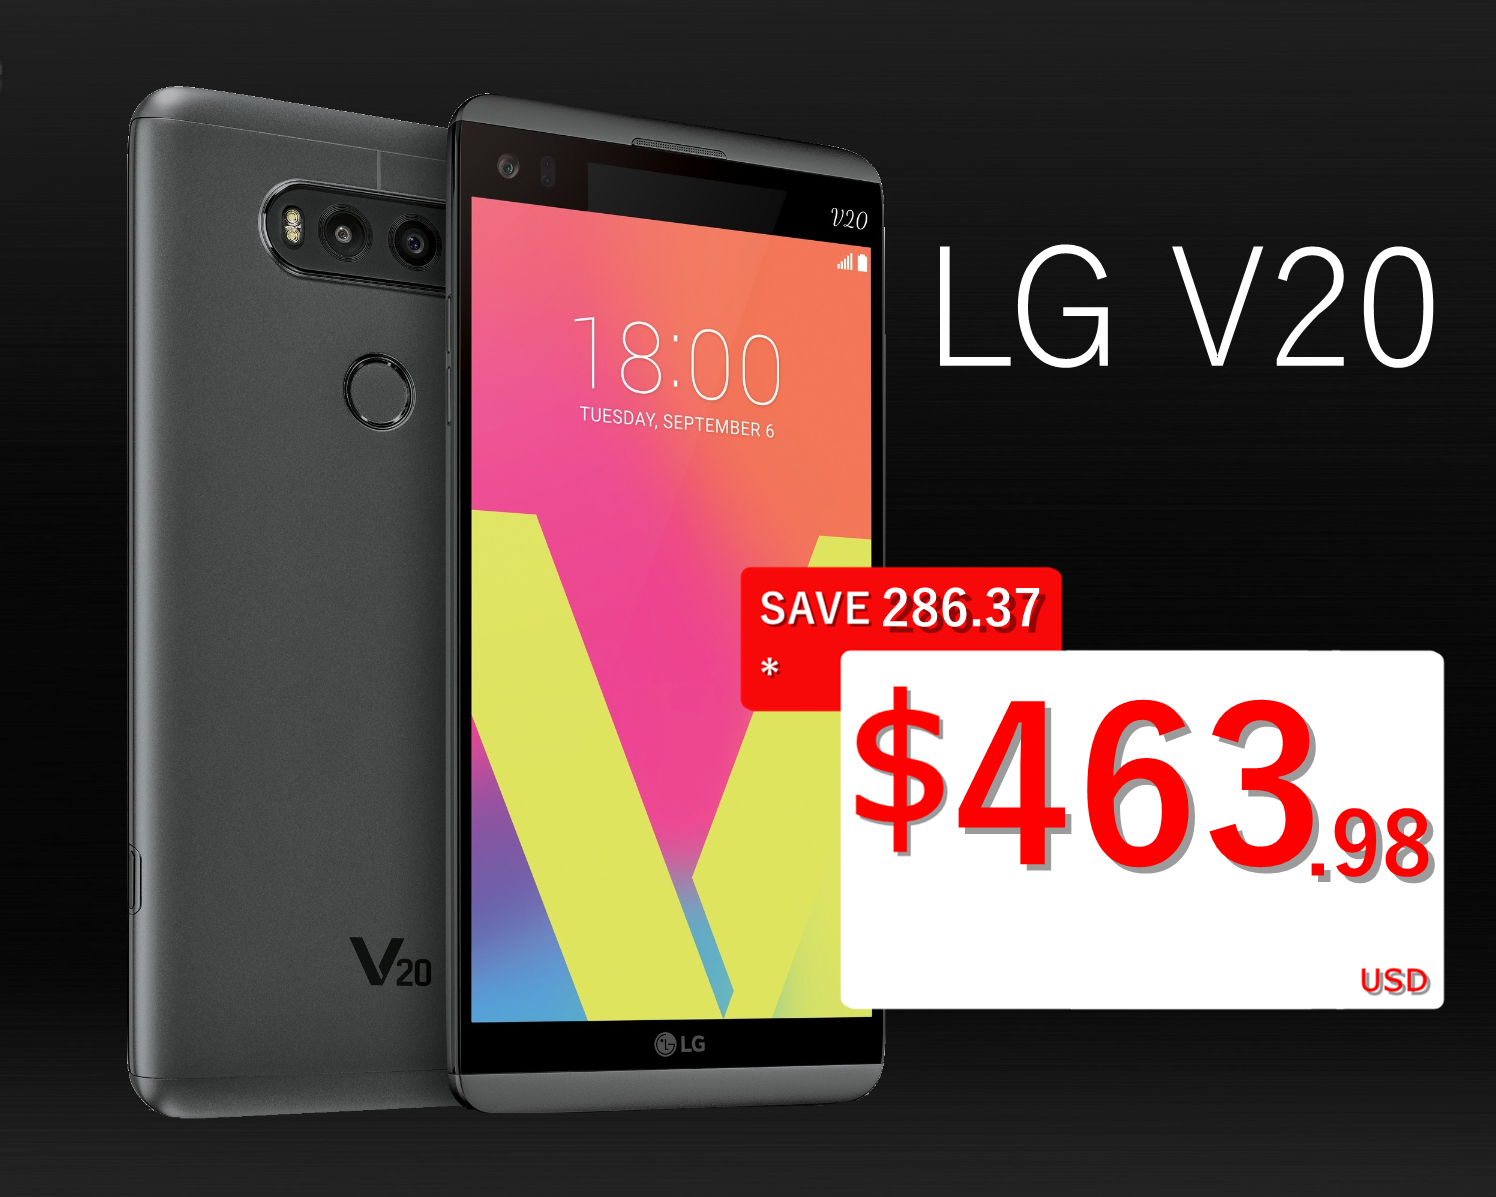 sale-lg-v20-bqshopestore.com.png